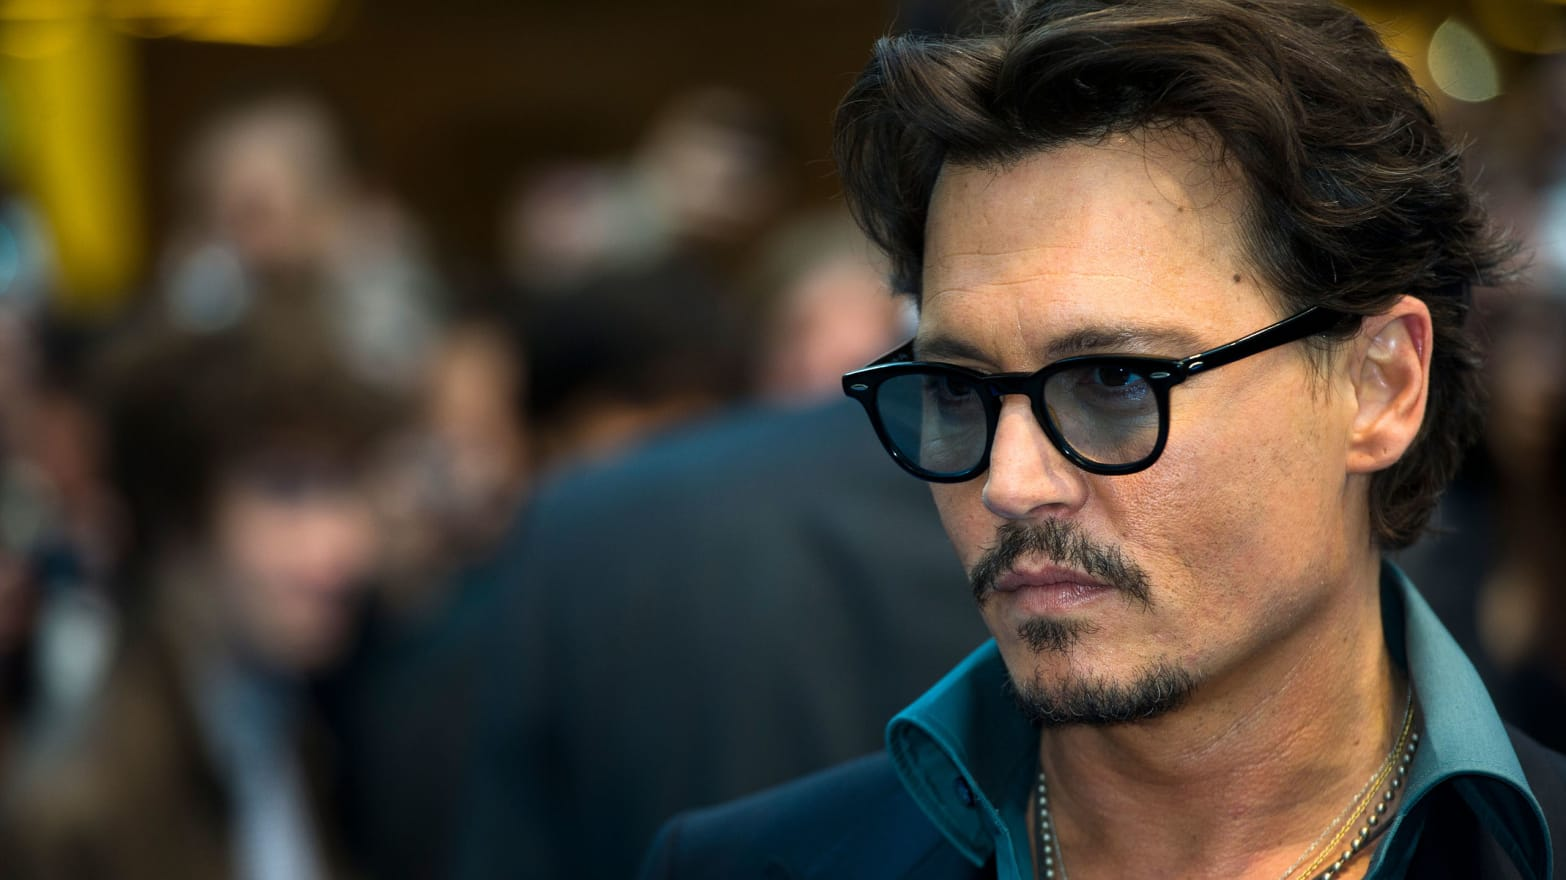 a6a429c43 Johnny Depp's Disturbing 'Sauvage' Campaign: Remember Amber Heard